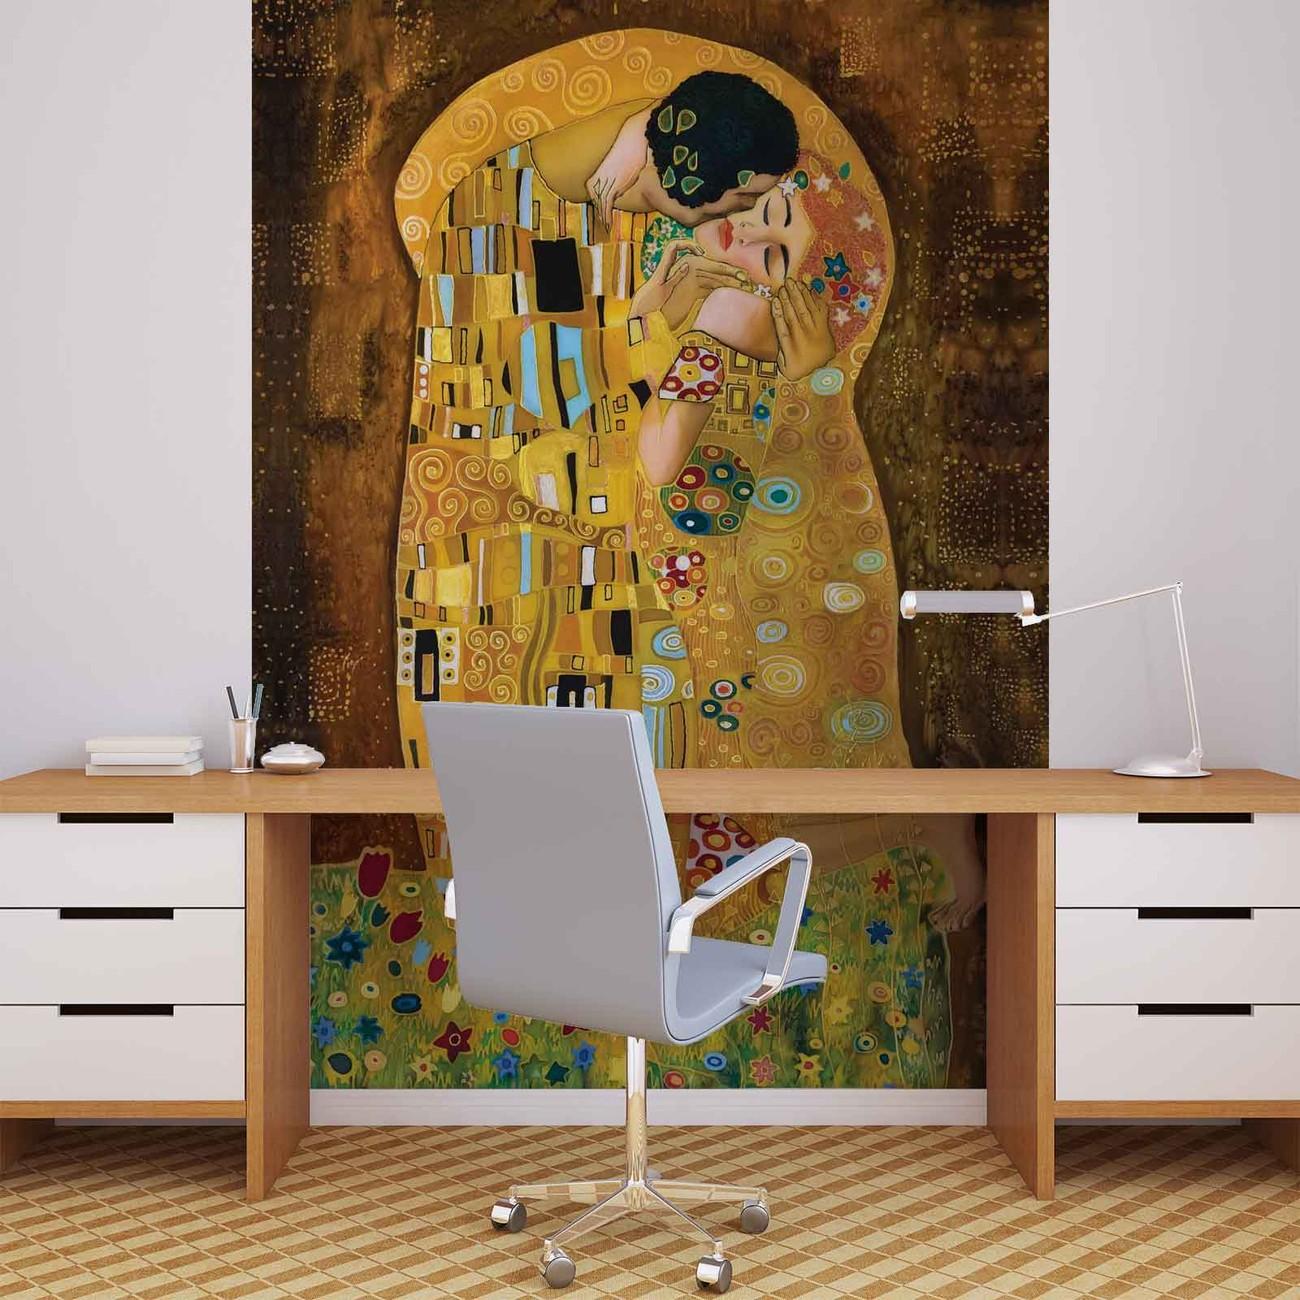 fototapete tapete gustav klimt kunst kuss bei europosters. Black Bedroom Furniture Sets. Home Design Ideas